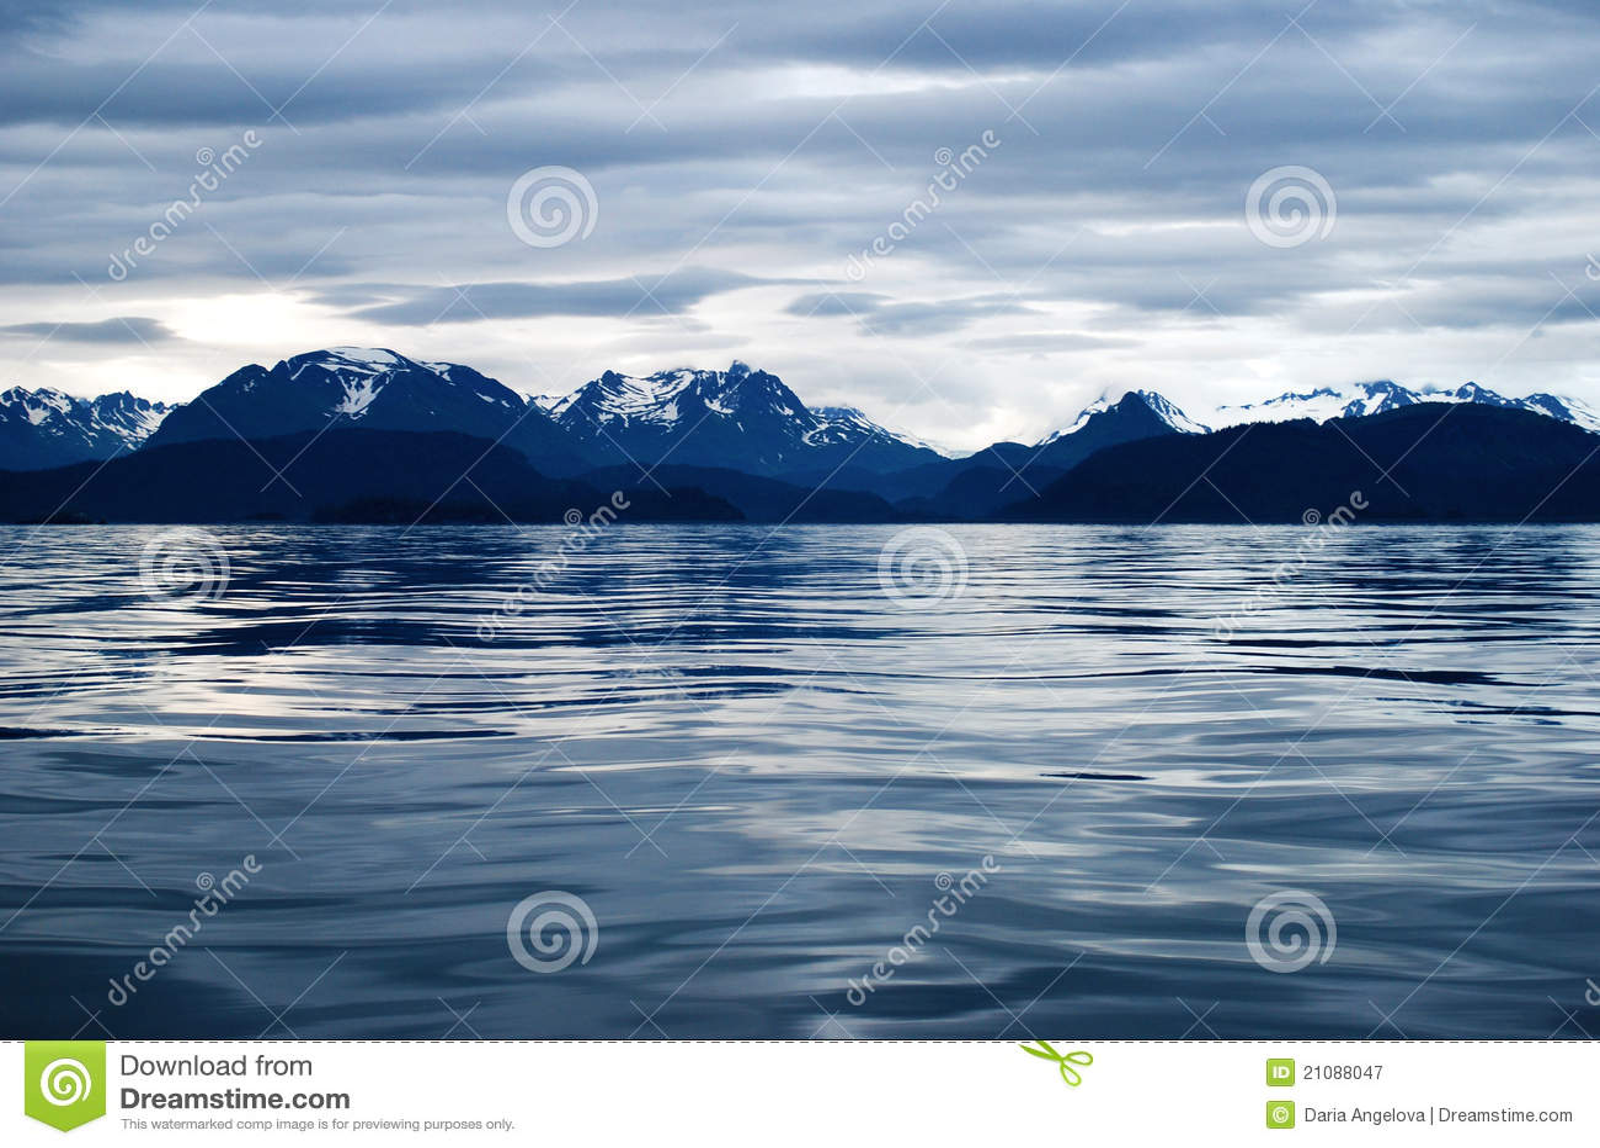 Local Alaska